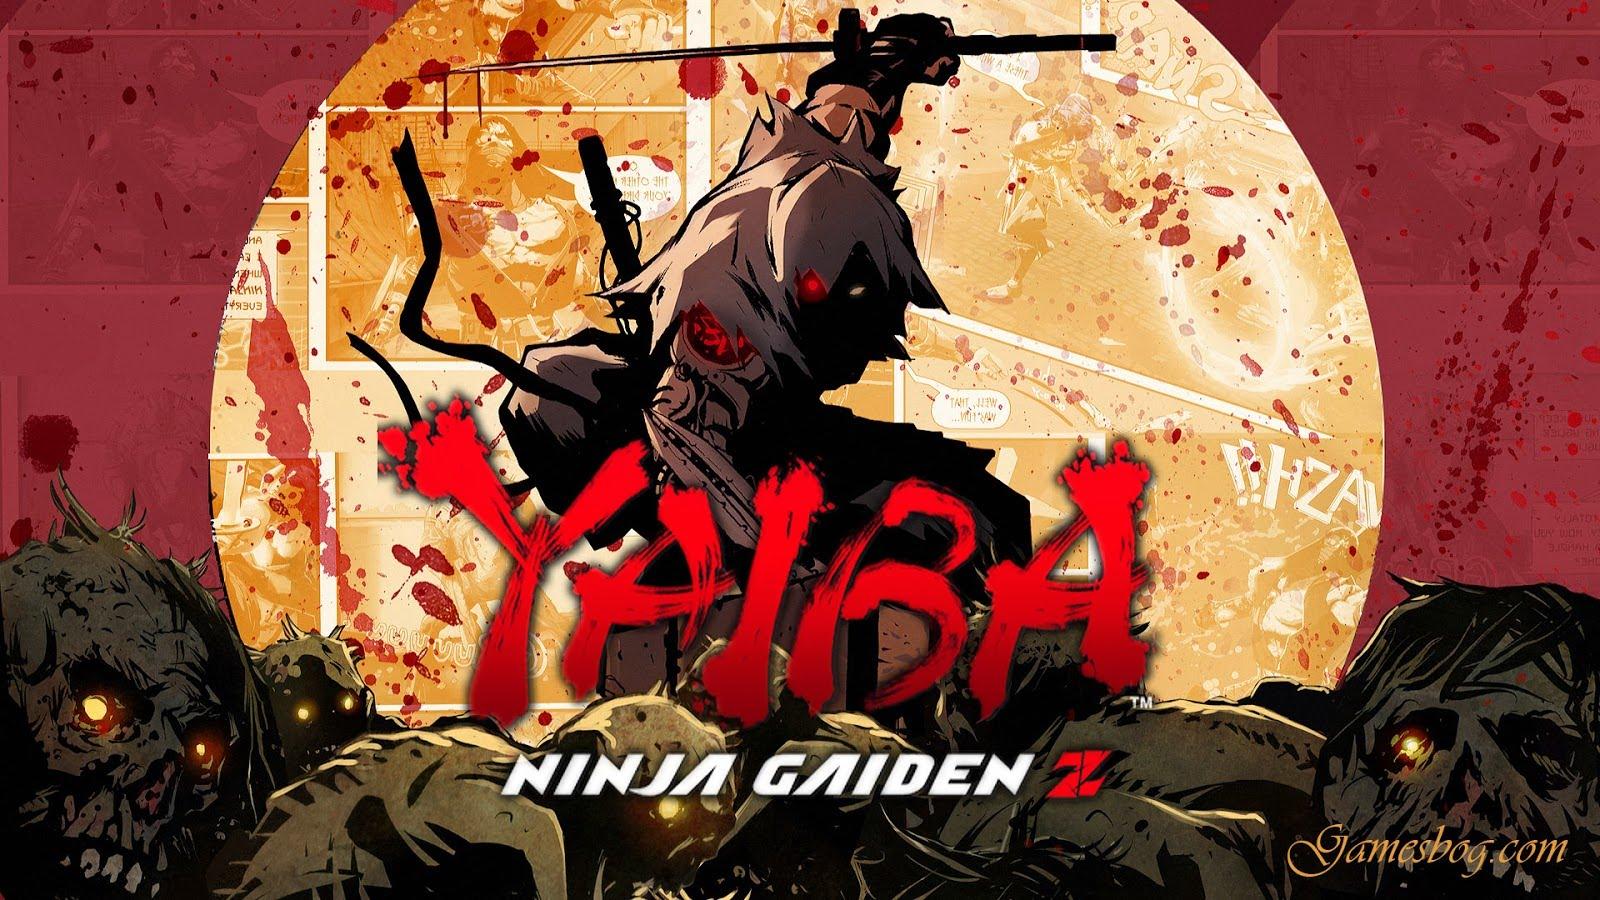 ninja gaiden wallpaper hd